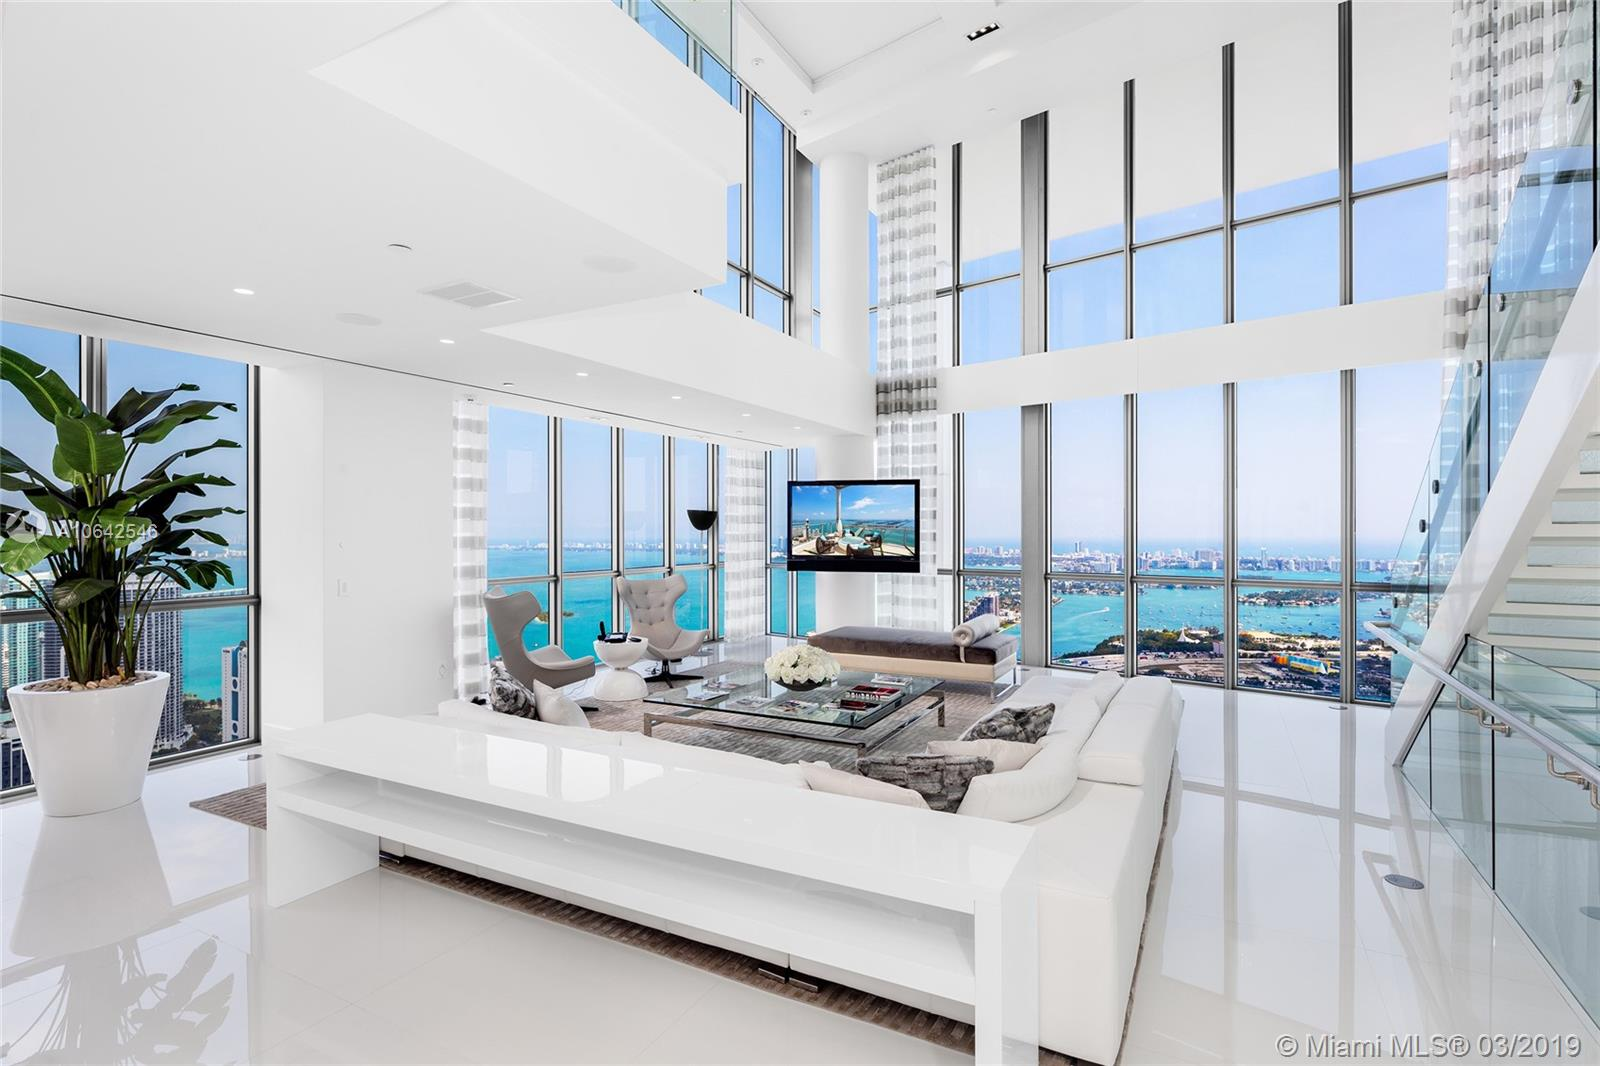 Main Property Image For 1100 Biscayne Blvd #6401